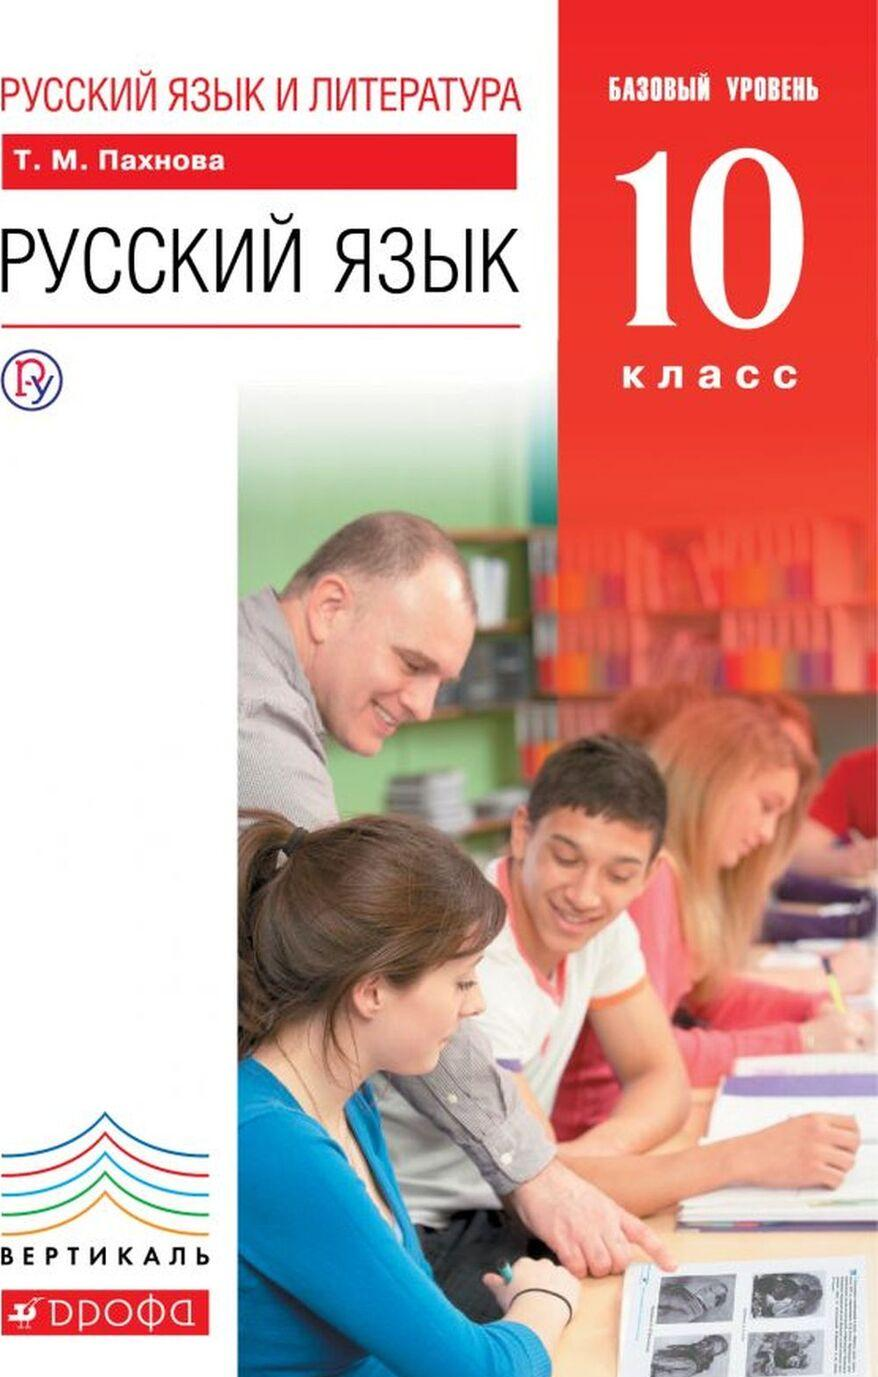 Russkij jazyk. Bazovyj uroven. 10 klass. Uchebnik | Pakhnova Tatjana Mikhajlovna